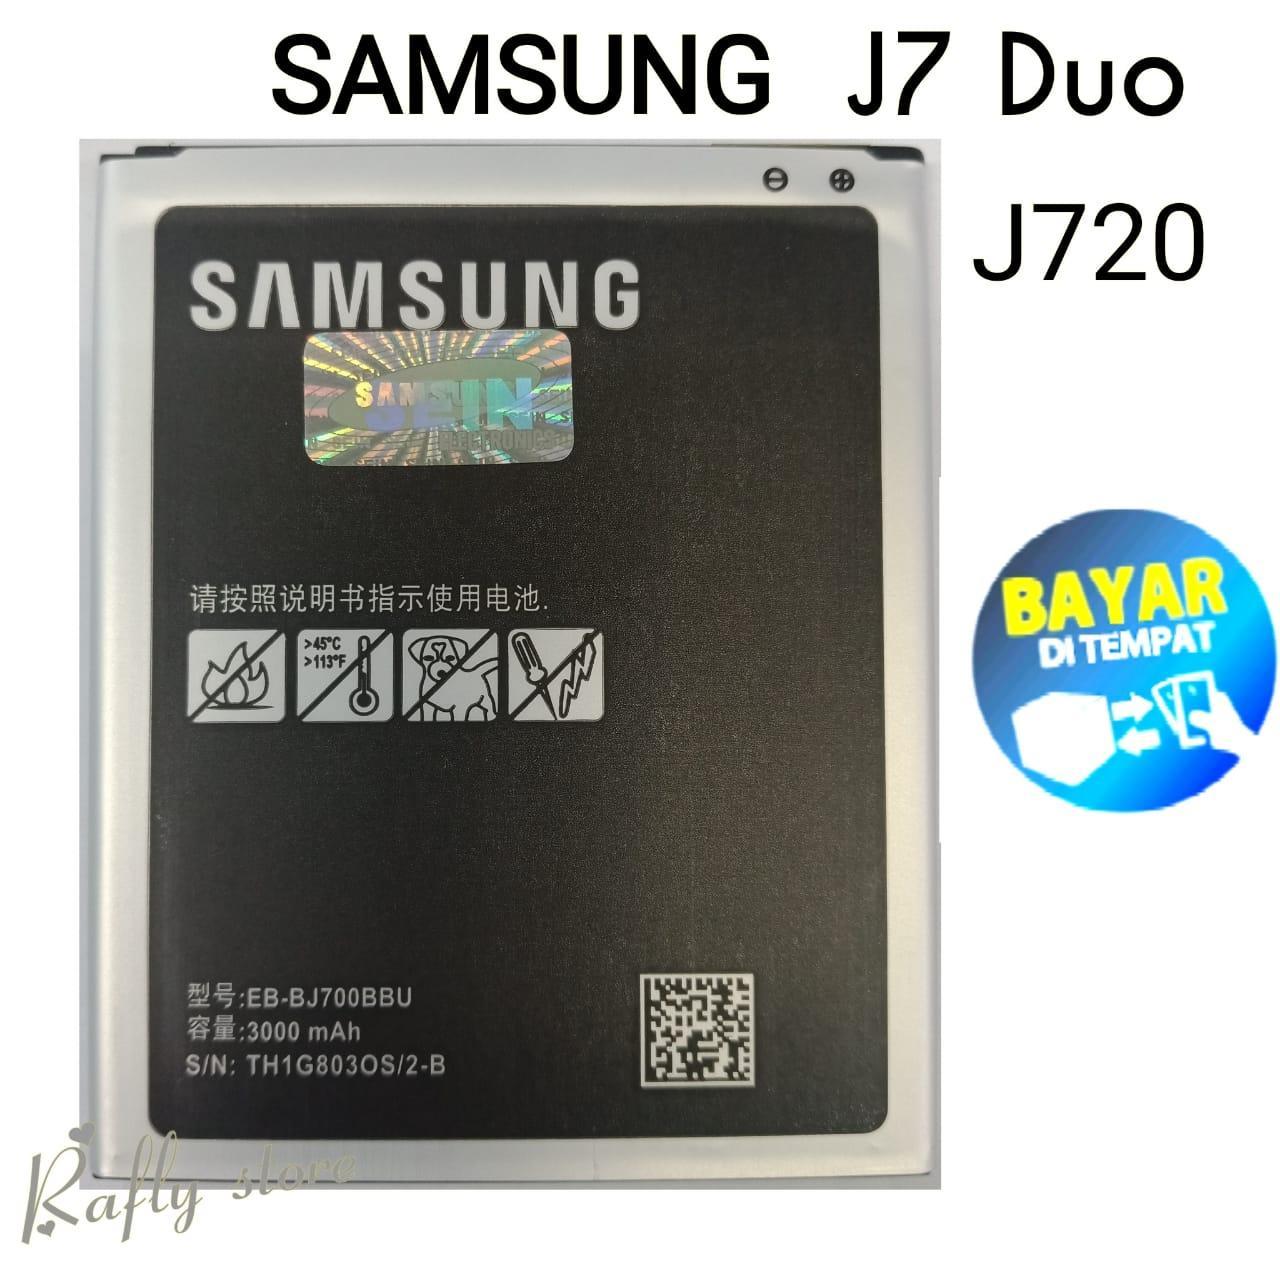 Rafly; Batrai Samsung J7 Duo (J720) Baterai Handphone Batre Android Battery Batere Samsung Galaxy J7 Duo (J720) EB-BJ700BBC 3000mAh / Rafly store